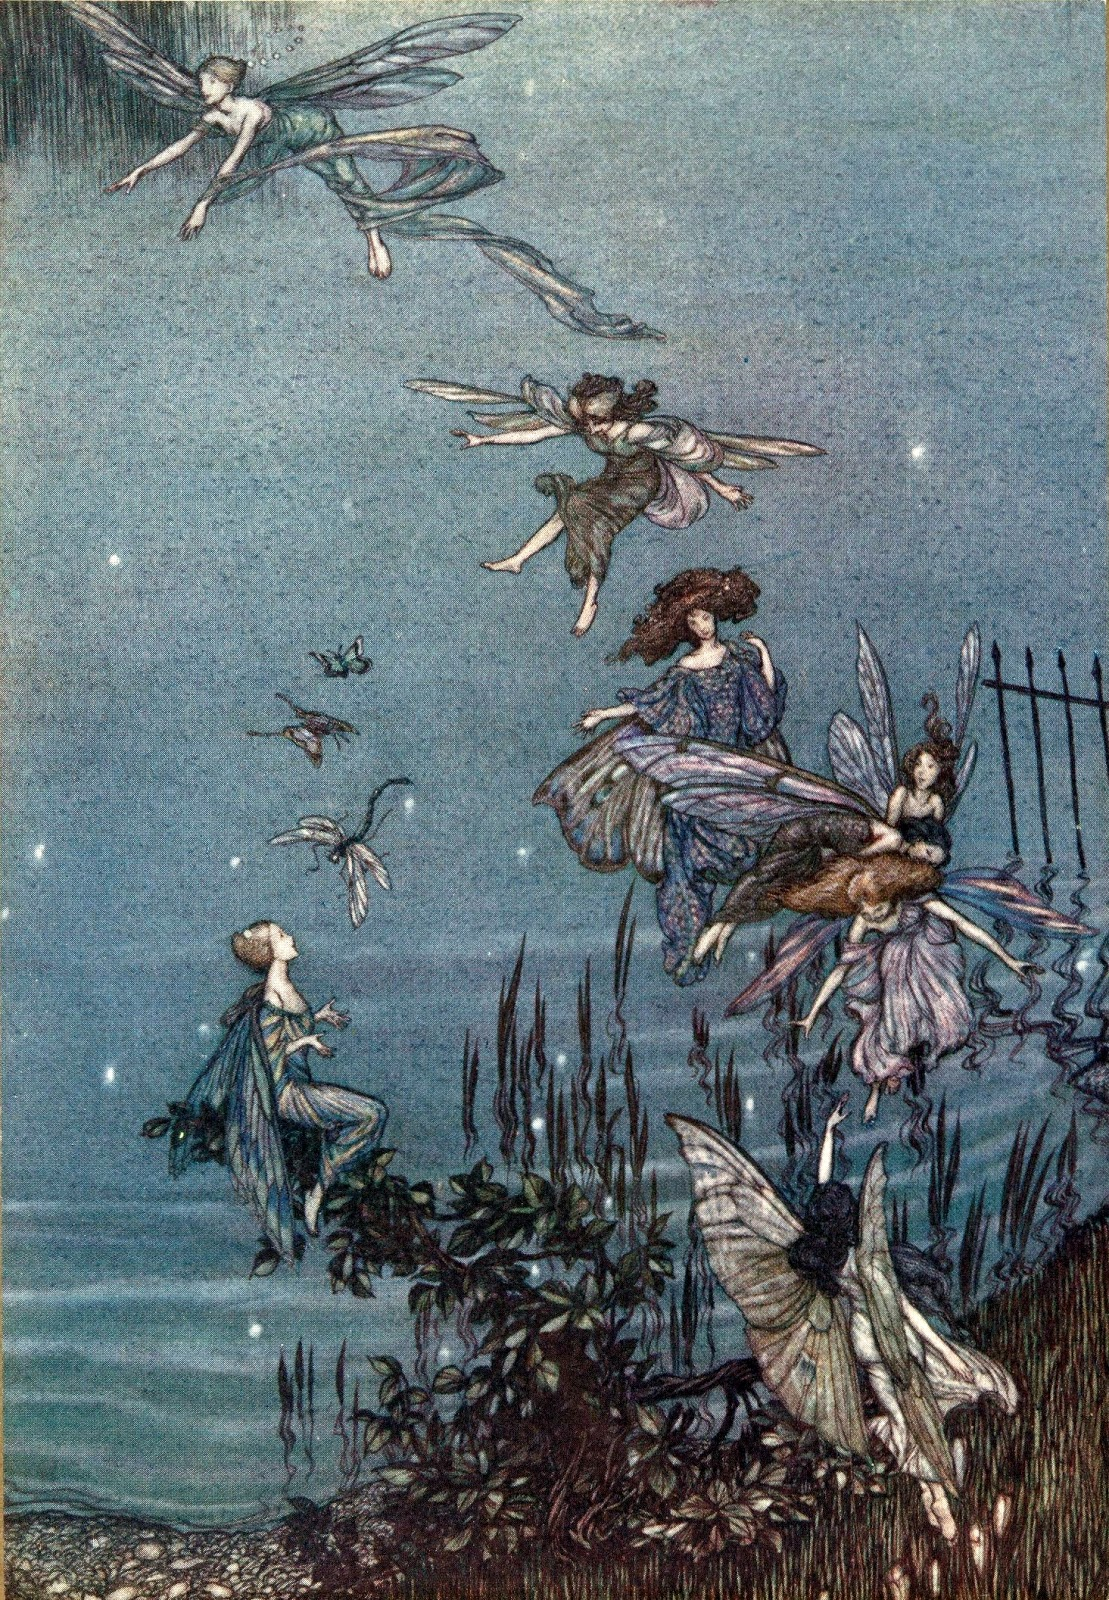 Art Of Narrative Arthur Rackhams Fairies Trees And Peter Pan